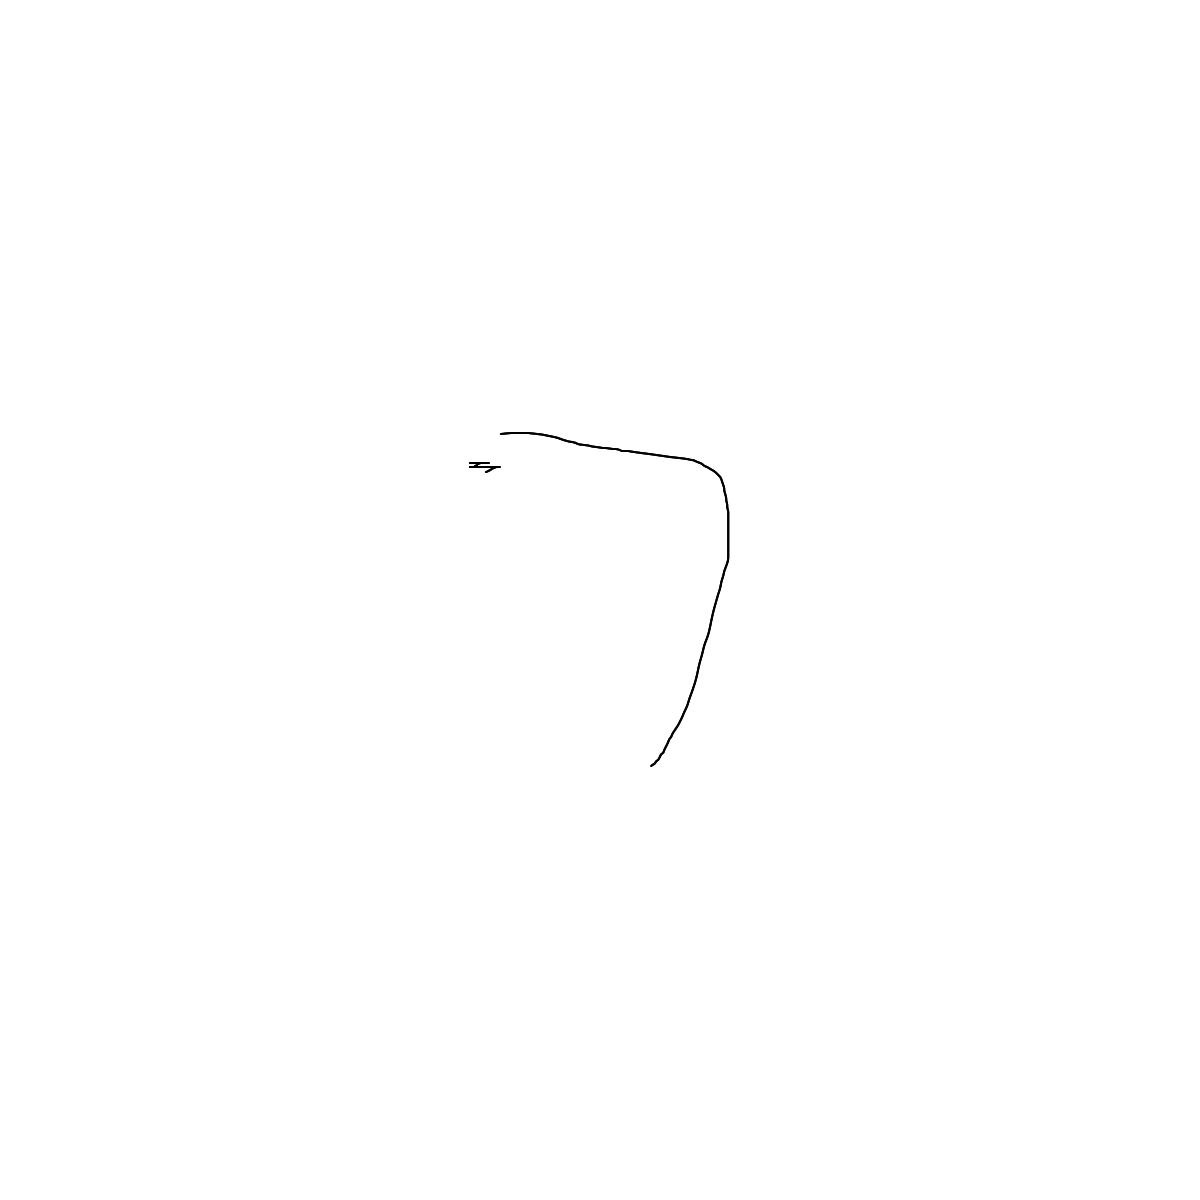 BAAAM drawing#23108 lat:6.4517178535461430lng: 3.4300475120544434